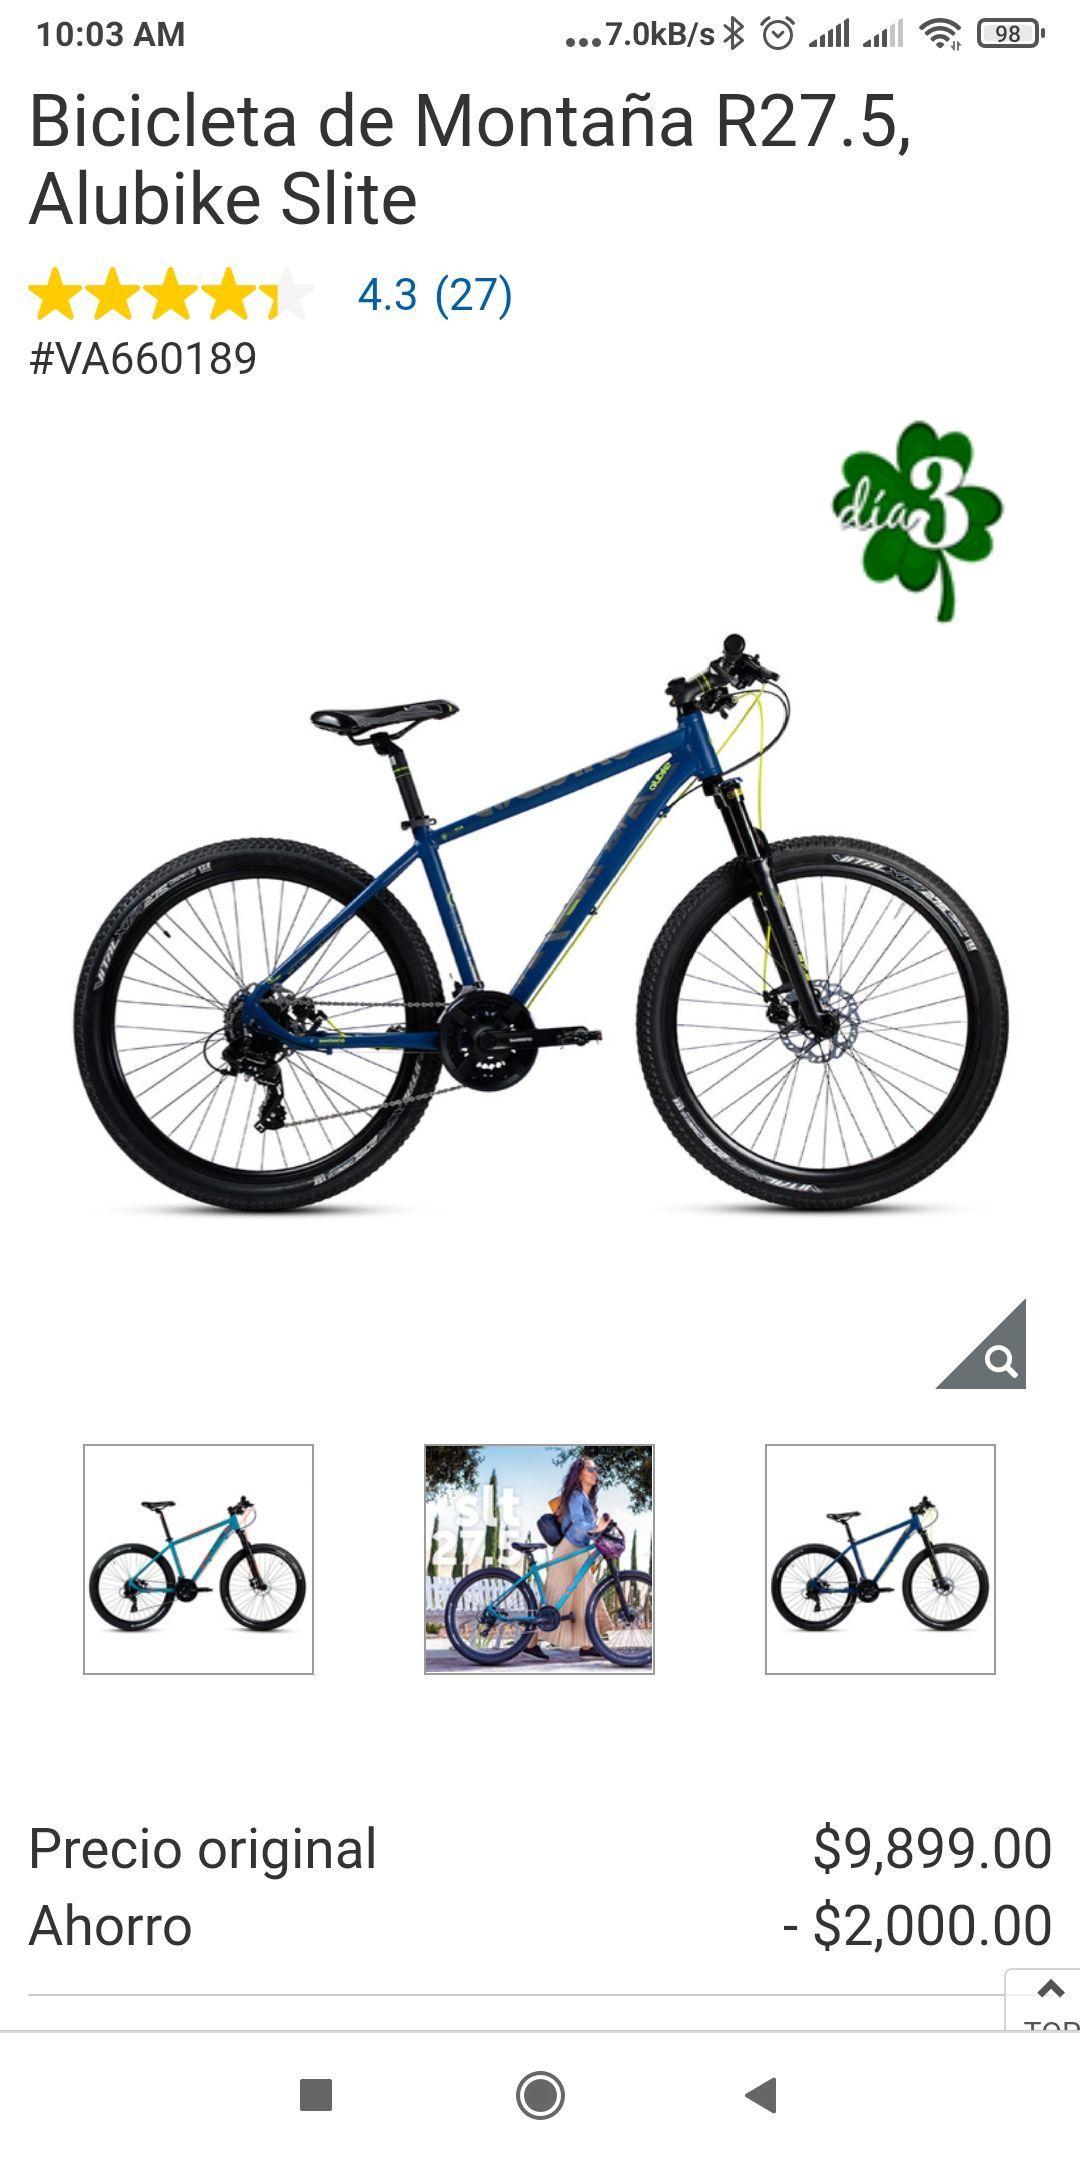 Costco Bicicleta de Montaña R27.5, Alubike Slite